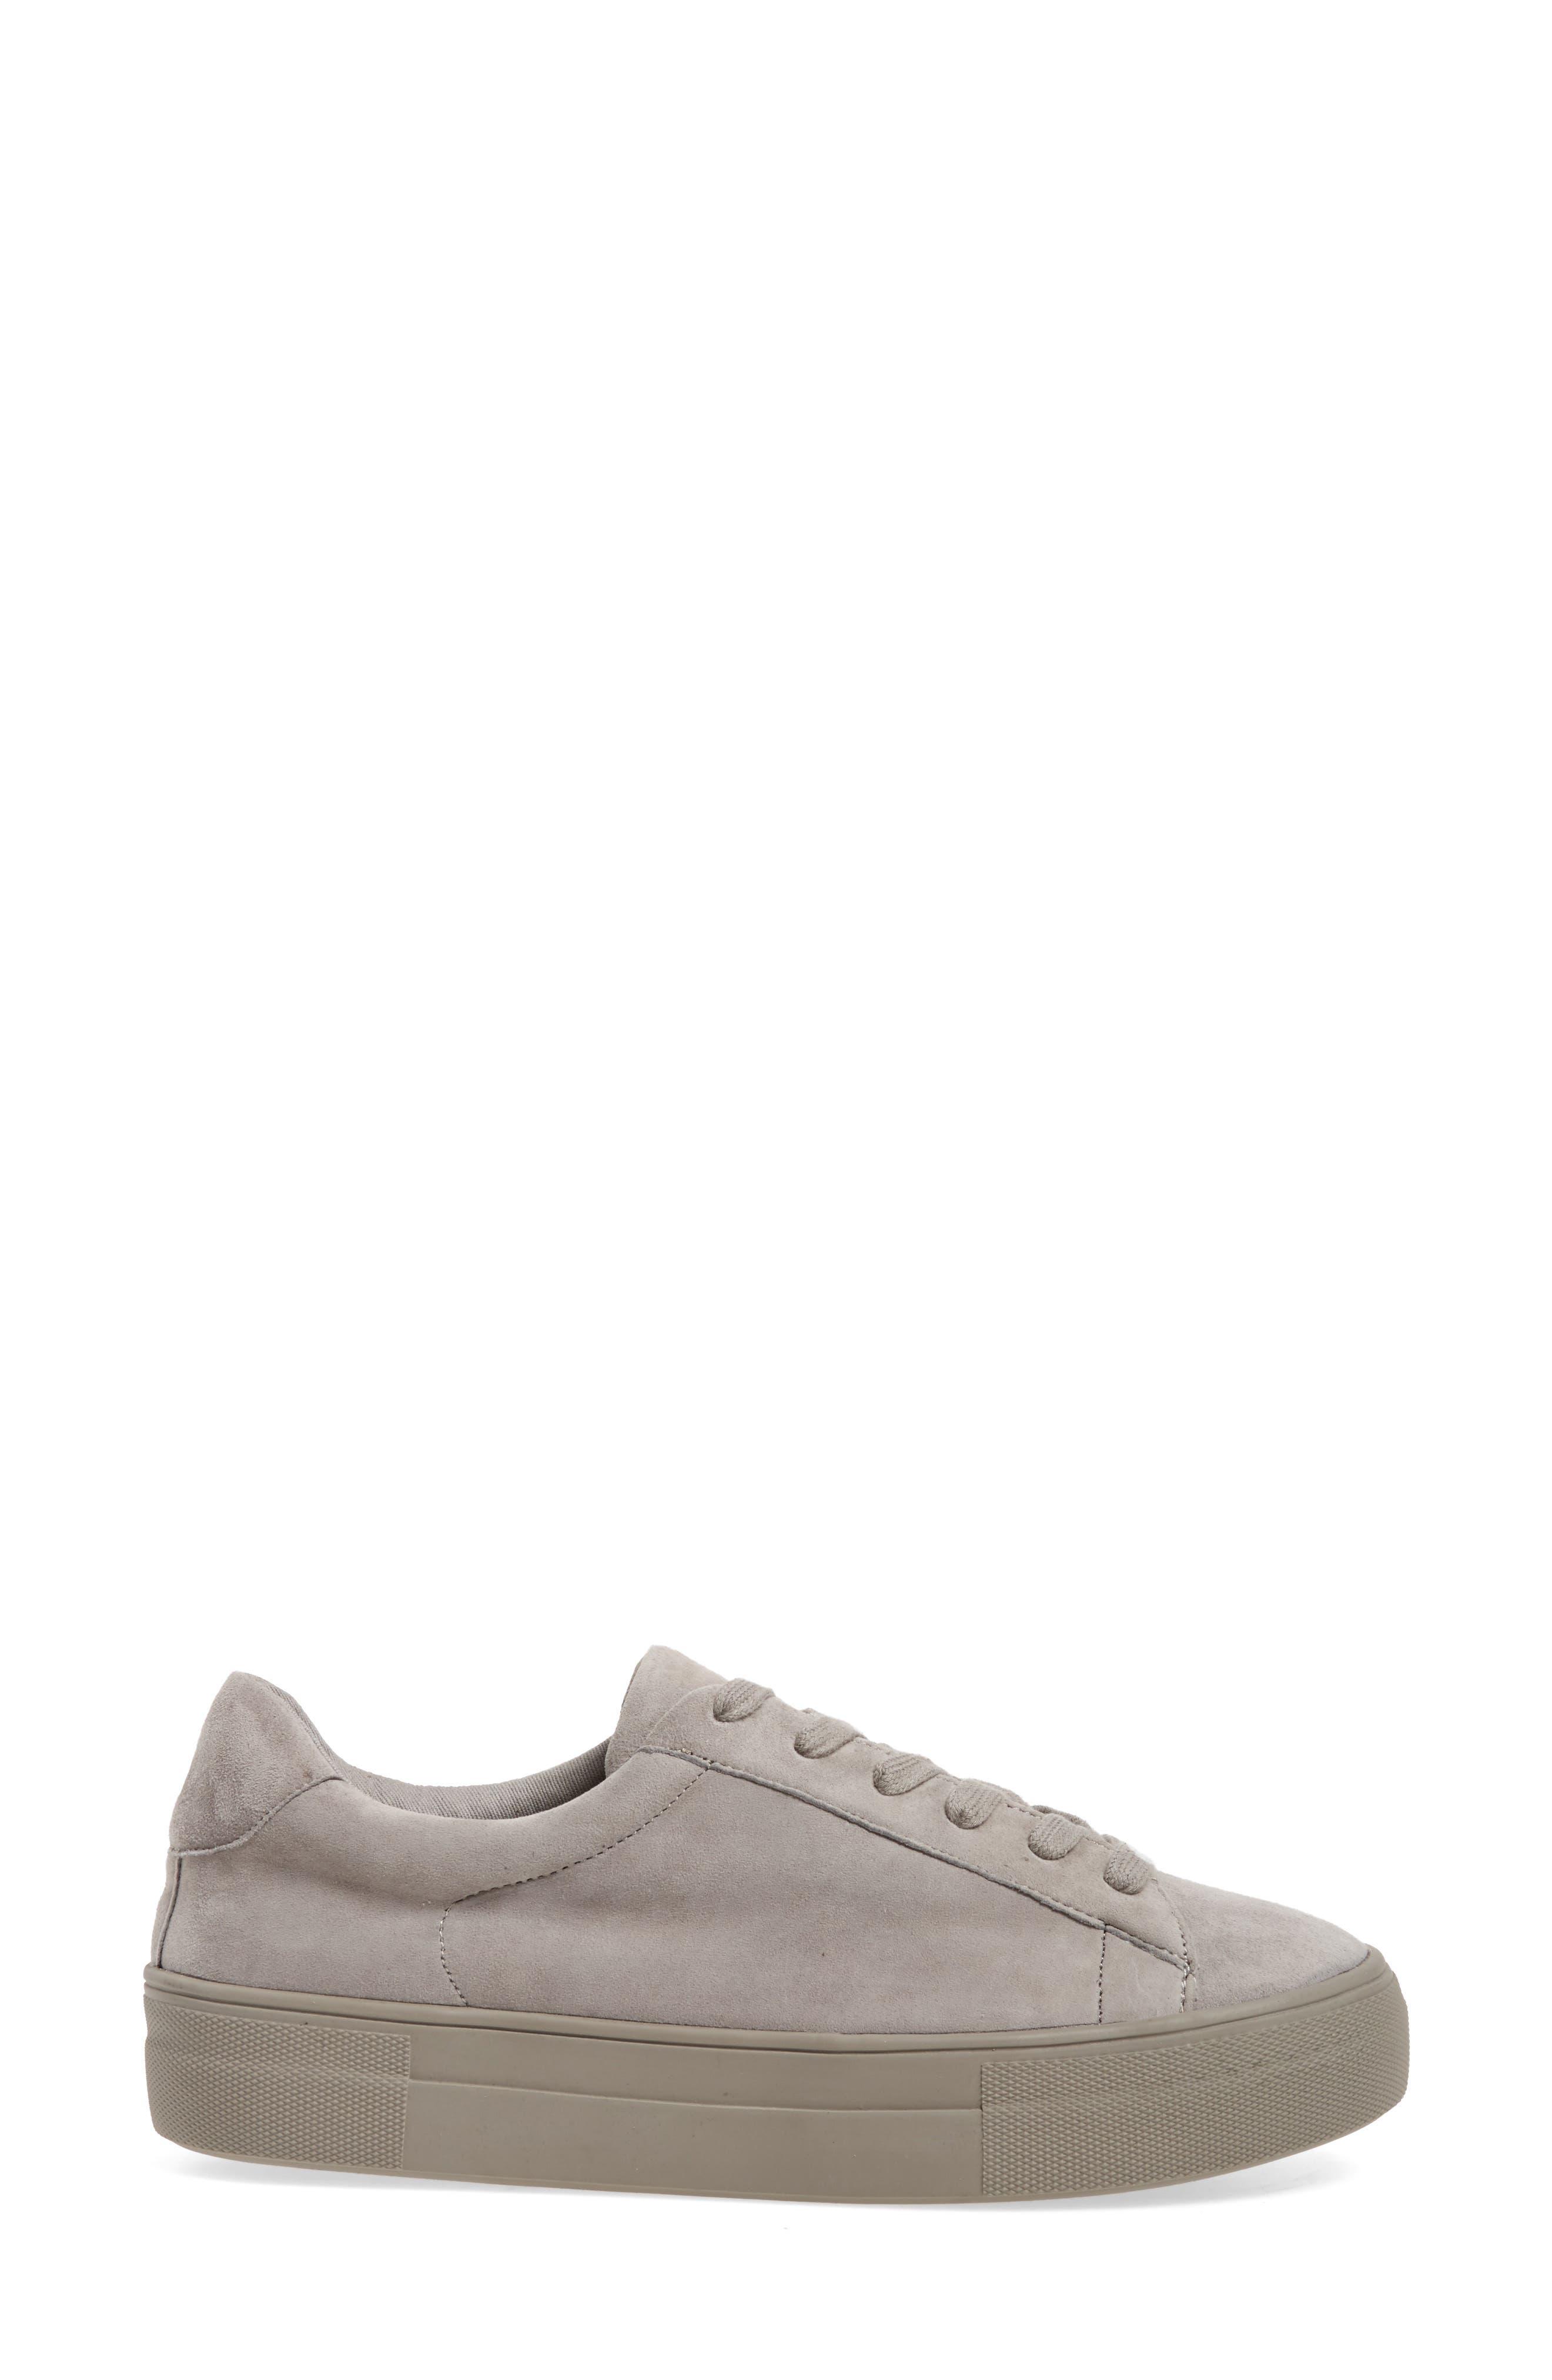 Gisela Low Top Sneaker,                             Alternate thumbnail 3, color,                             020